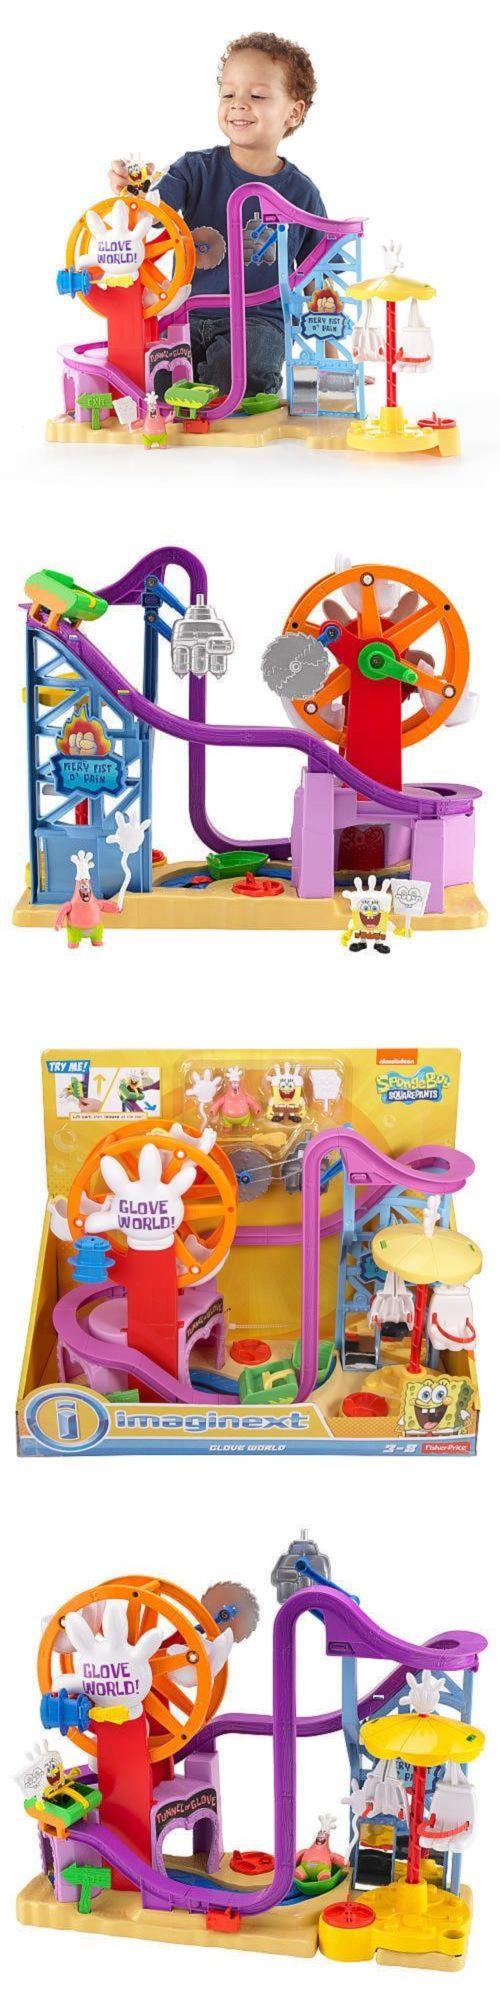 SpongeBob Squarepants 20919: Fisher Price Imaginext Sponge Bob Square Pants Glove World New Toy Kids Present -> BUY IT NOW ONLY: $80 on eBay!